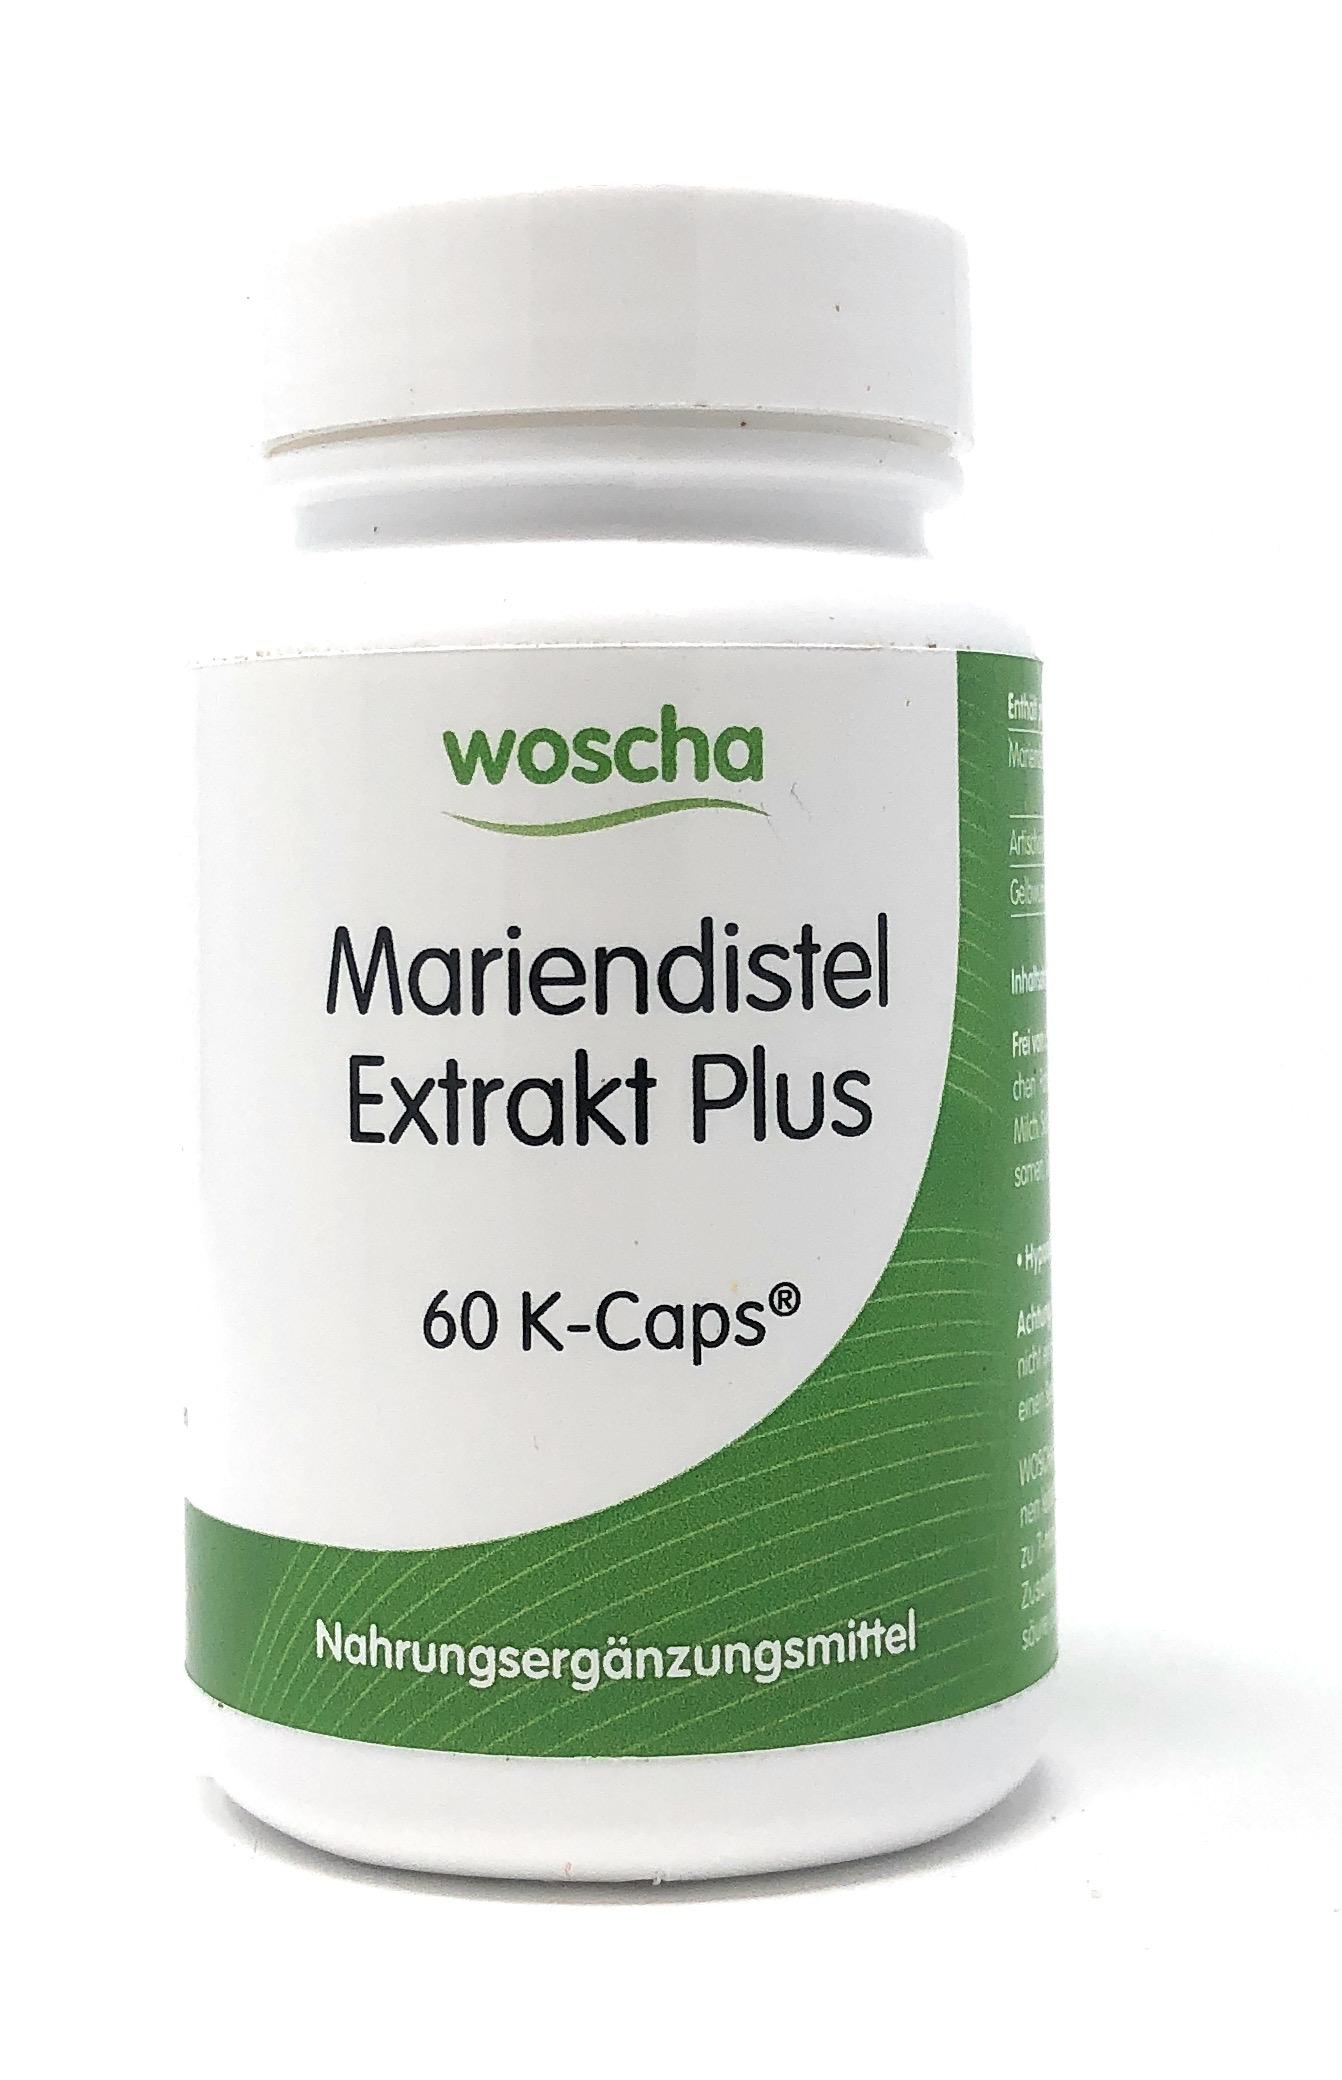 woscha Mariendistel Extrakt Plus 60 veg. K-CAPS® (35g)(vegan)